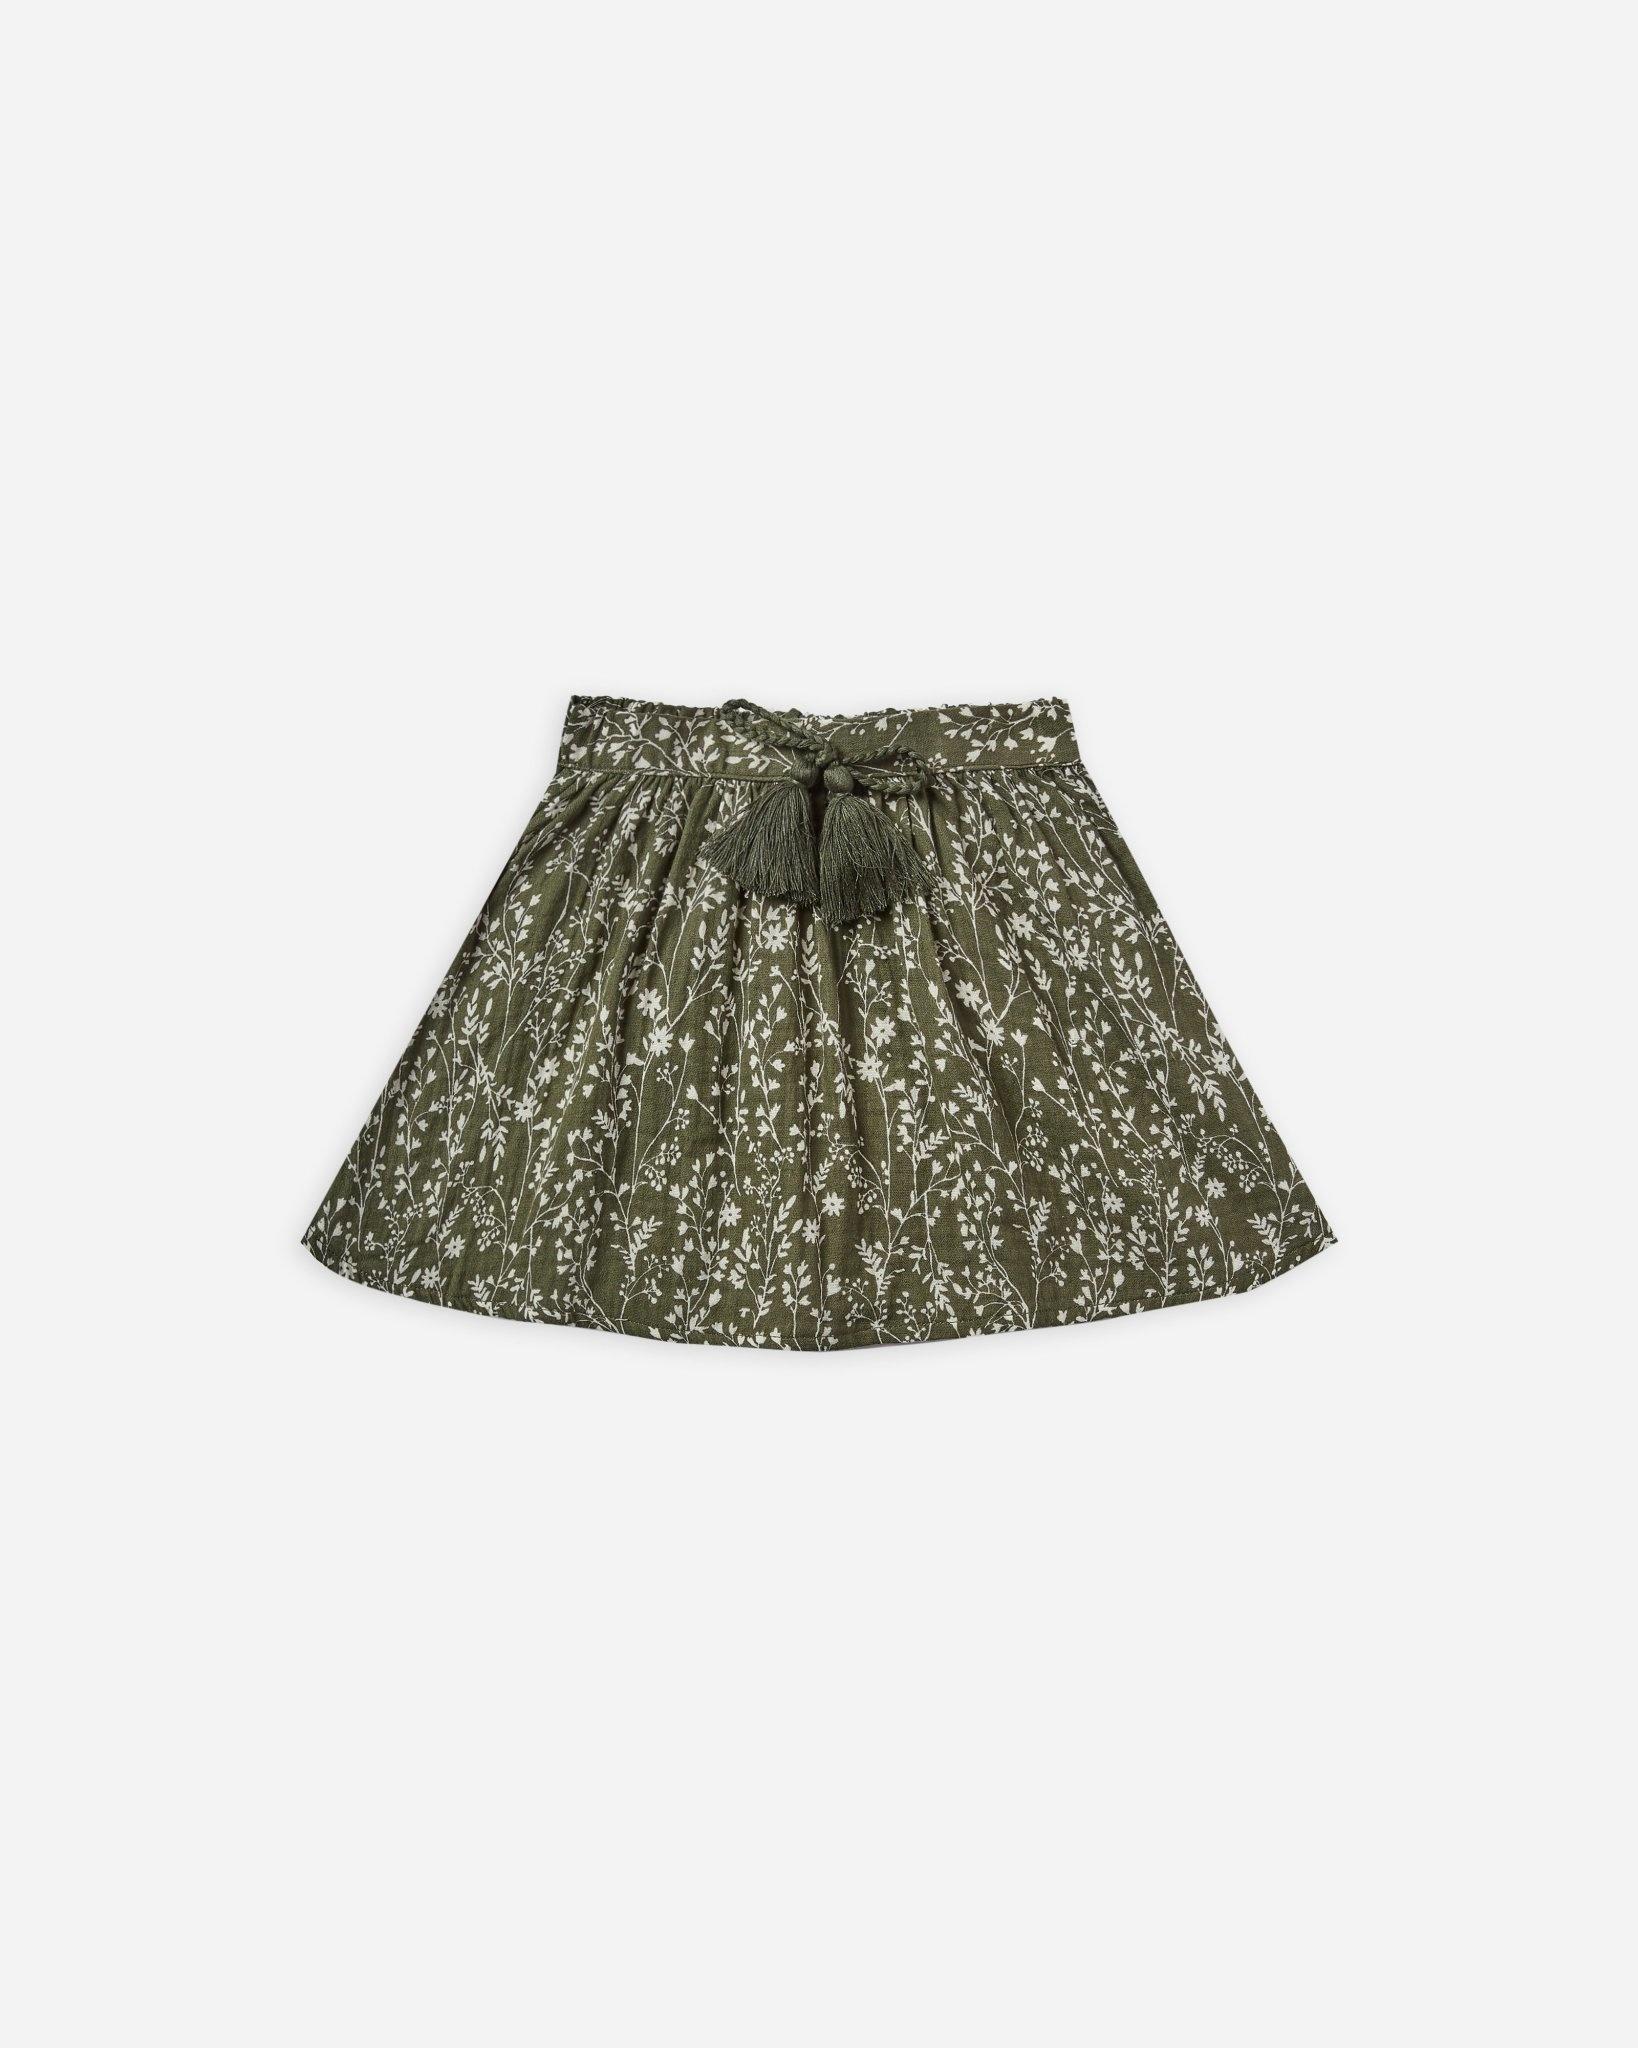 Rylee & Cru Forest Vines Mini Skirt